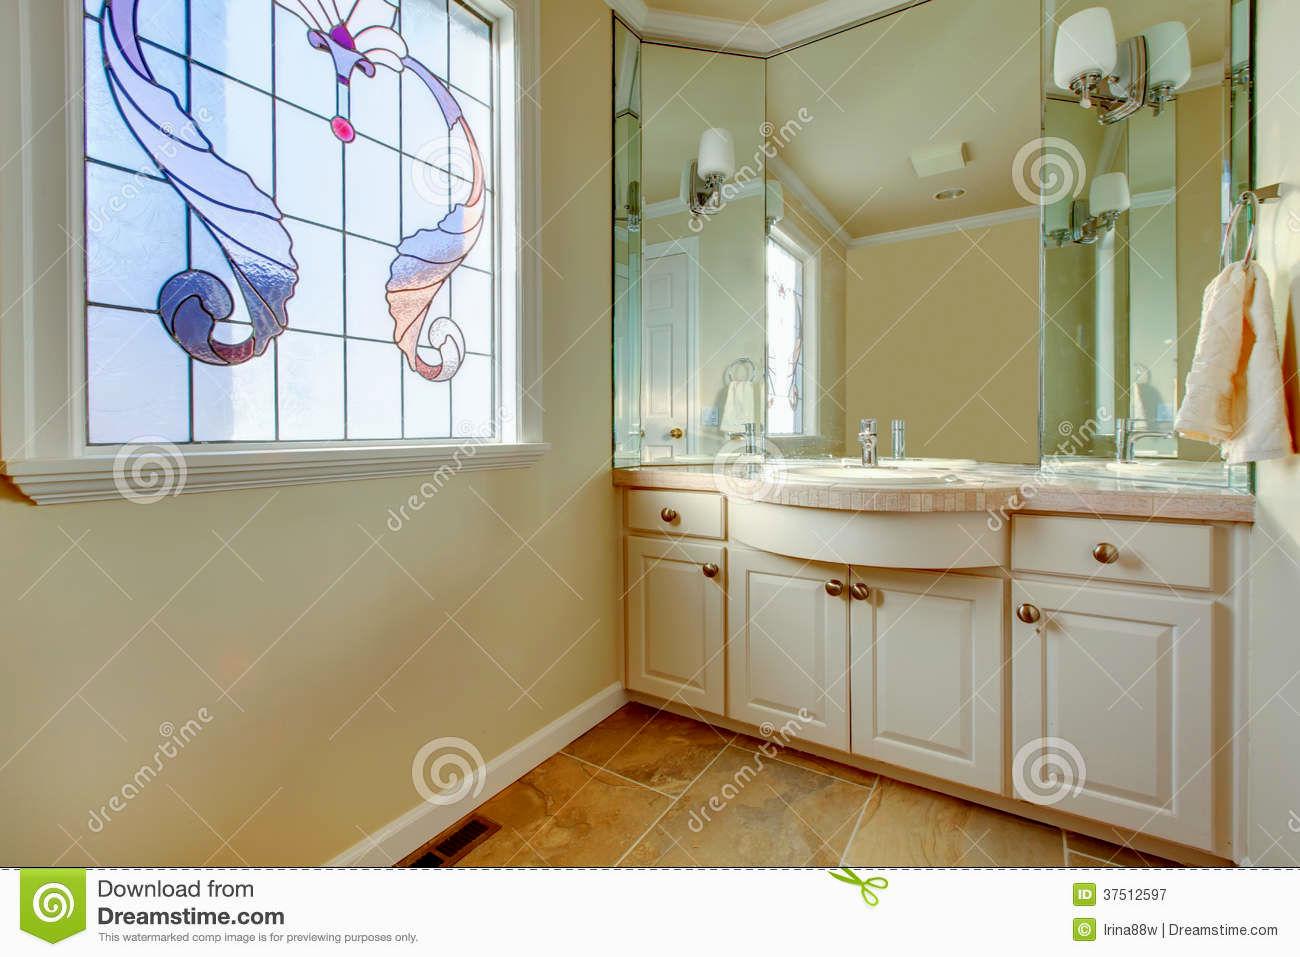 beautiful bathroom mirror cabinets image-Fascinating Bathroom Mirror Cabinets Construction